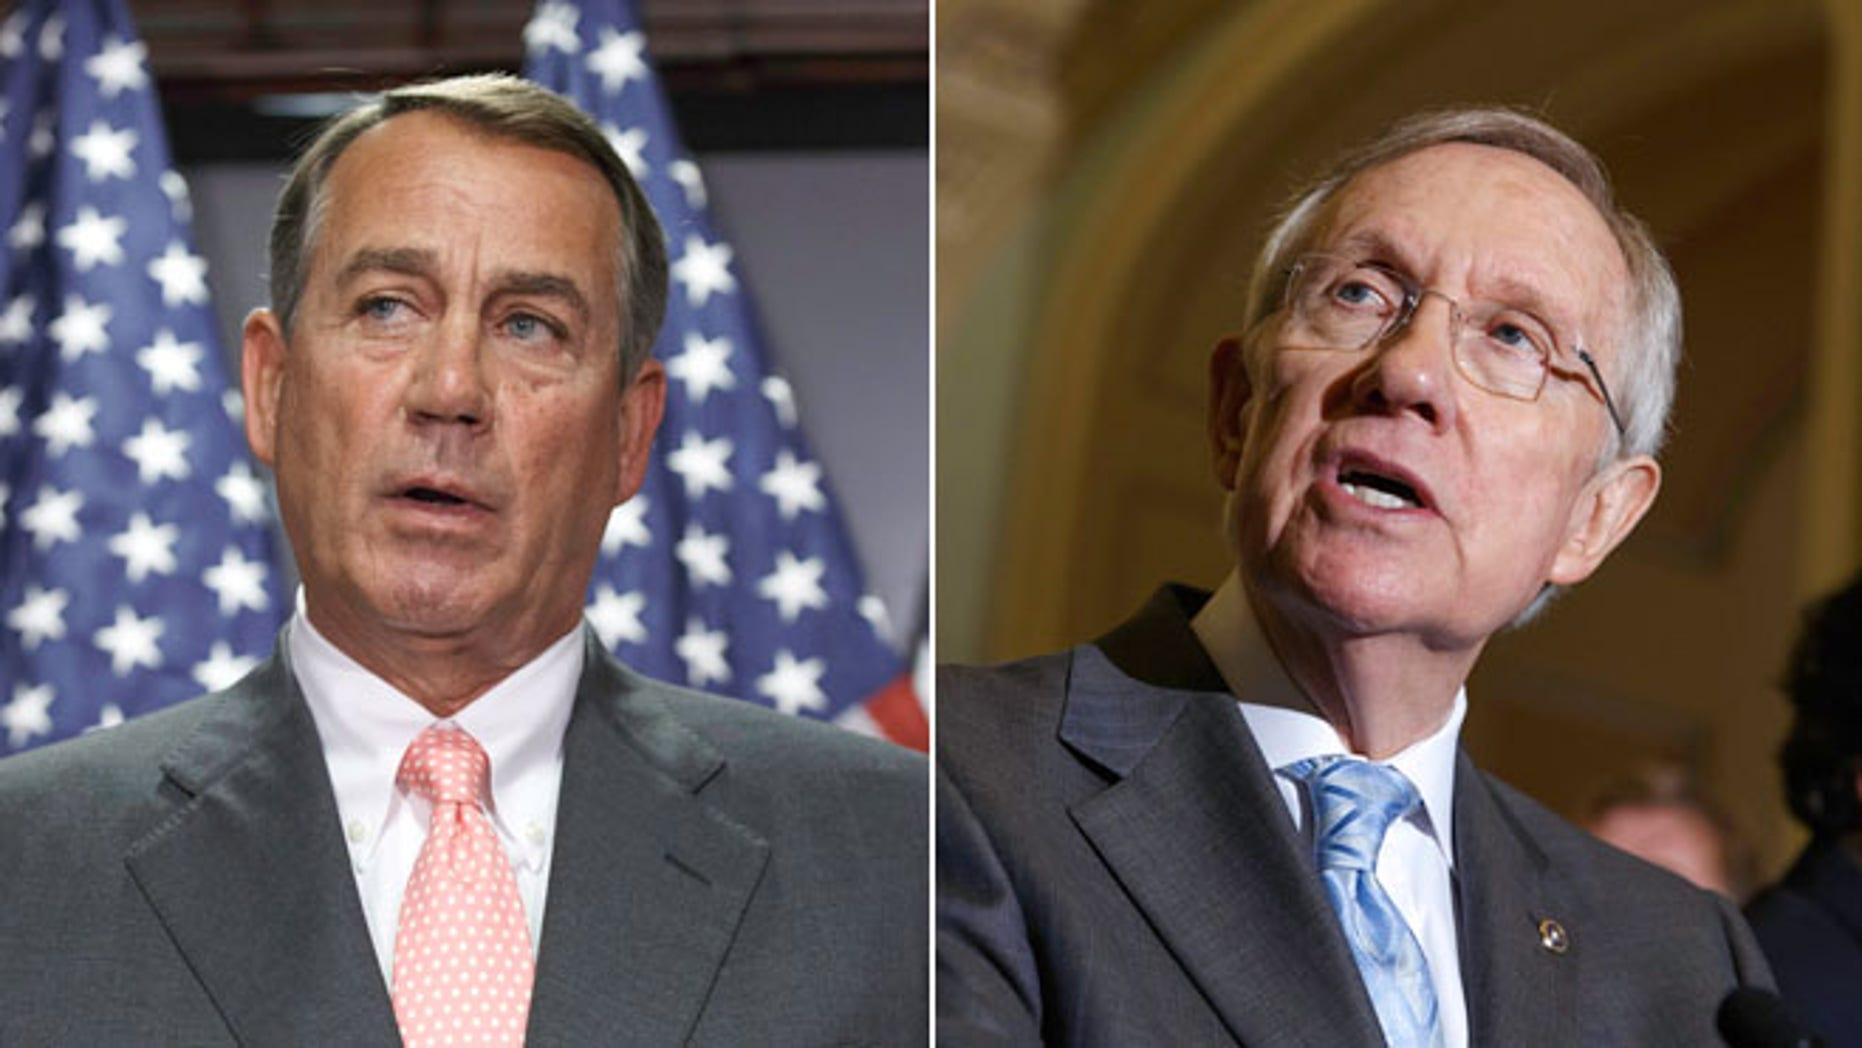 Speaker of the House John Boehner, Thursday, July 17, 2014 and Senate Majority Leader Harry Reid, Tuesday, July 15, 2014, on Capitol Hill in Washington.